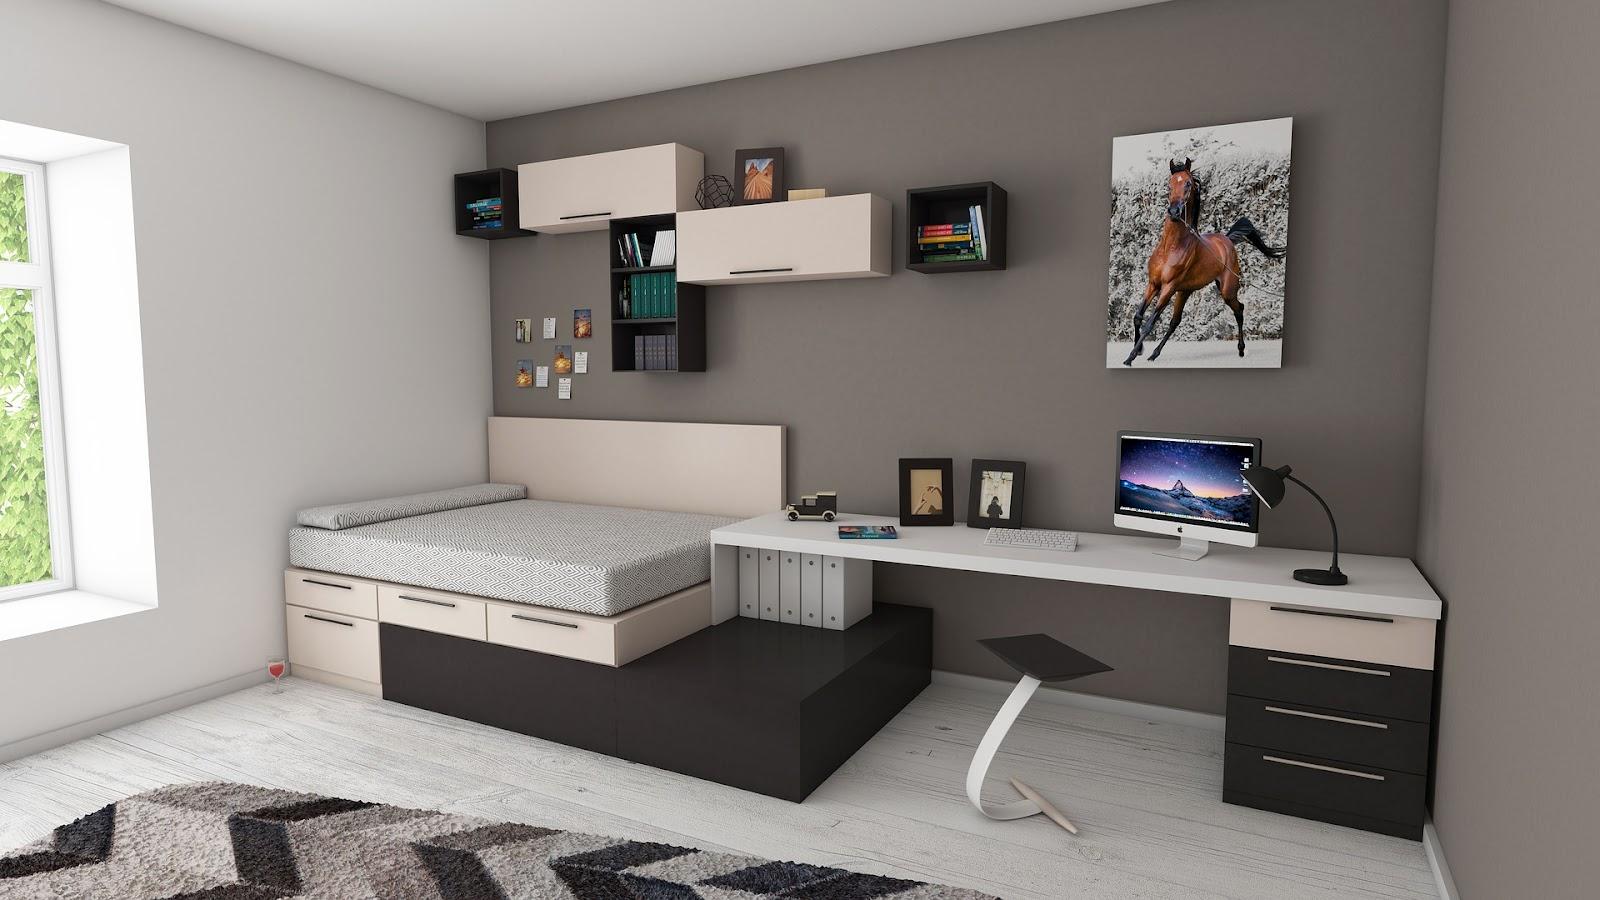 apartment-2558277_1920.jpg